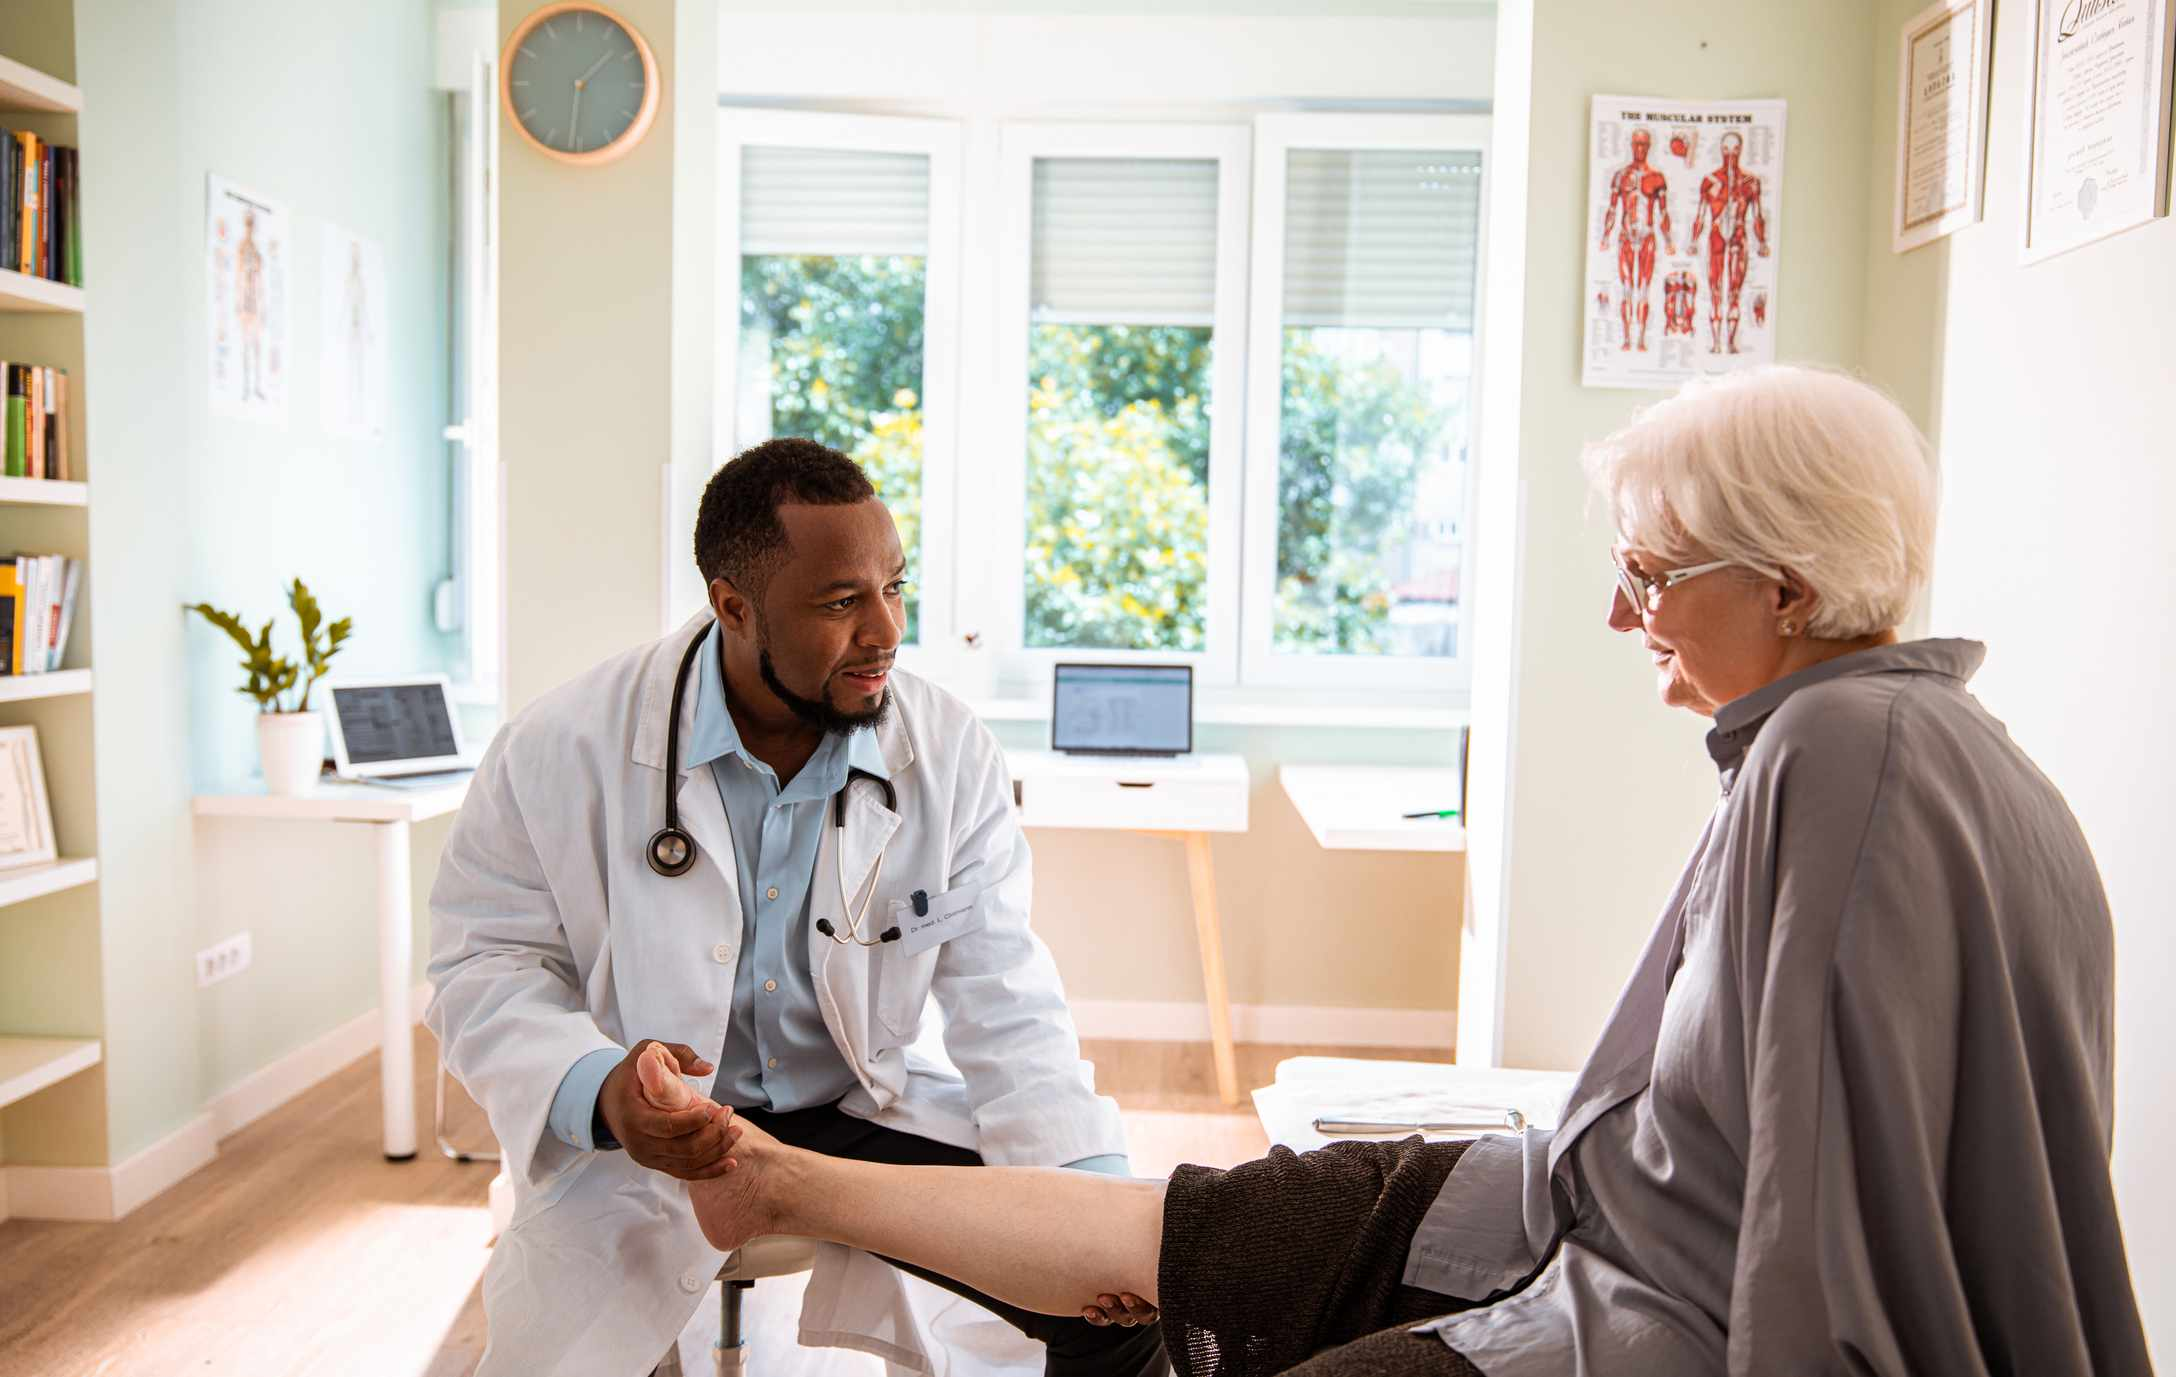 Doctor examines senior woman's leg.